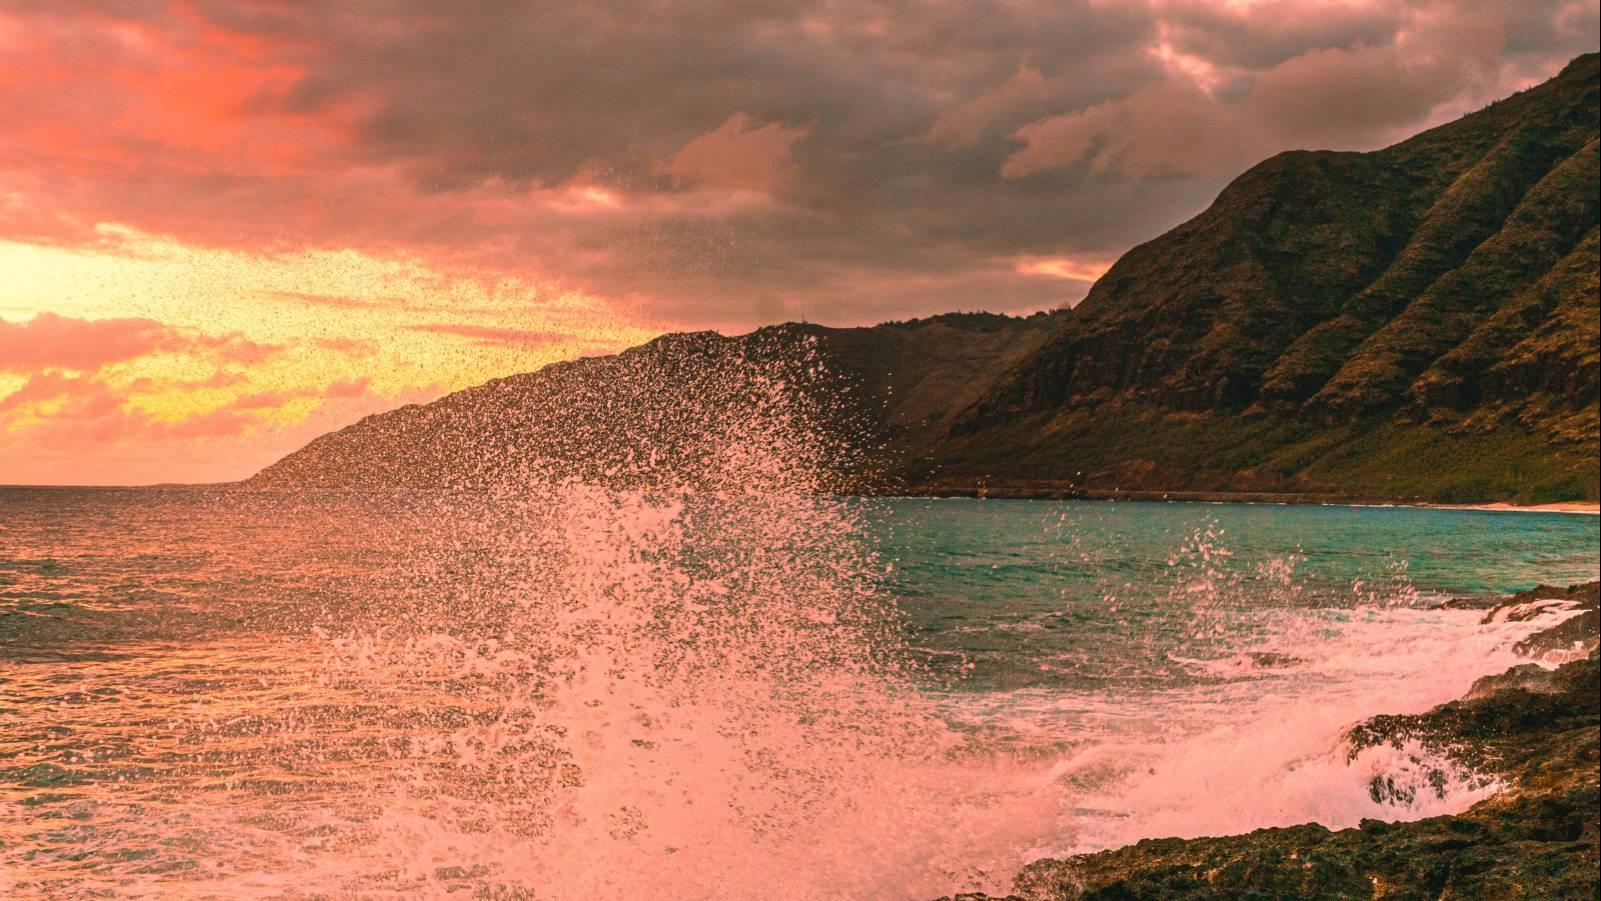 oahu sunset over the beach